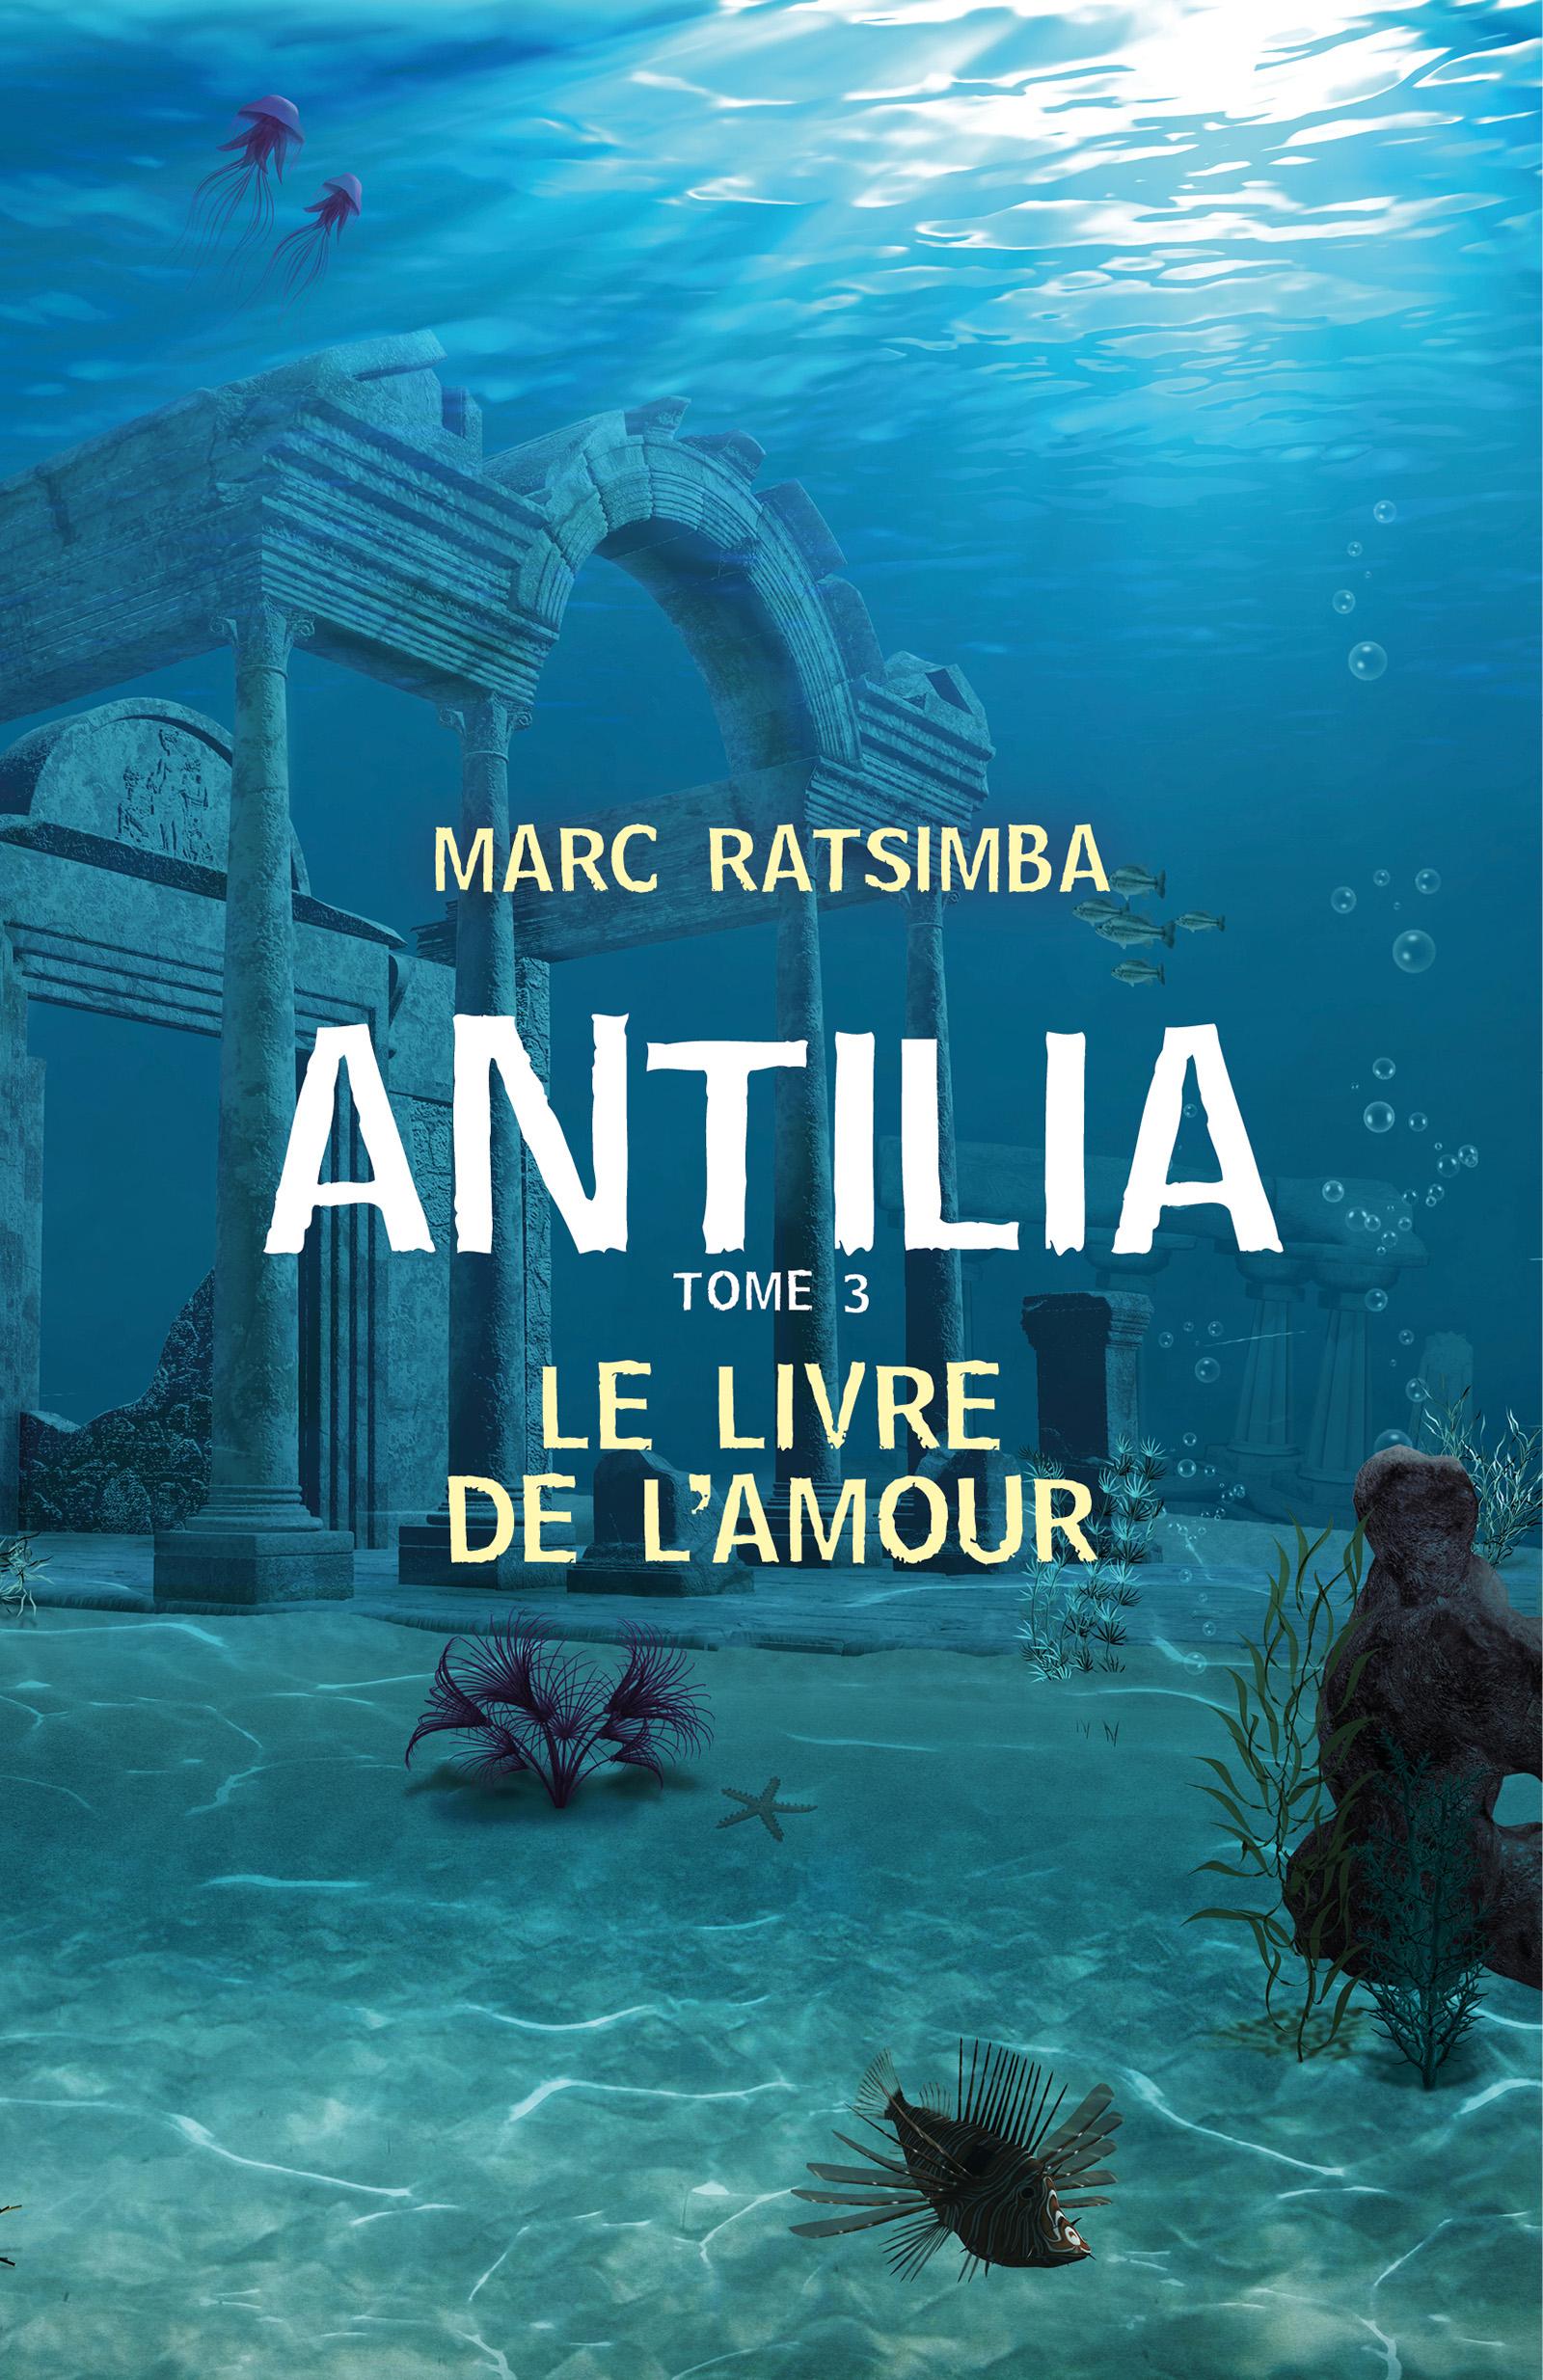 Antilia - Tome 3